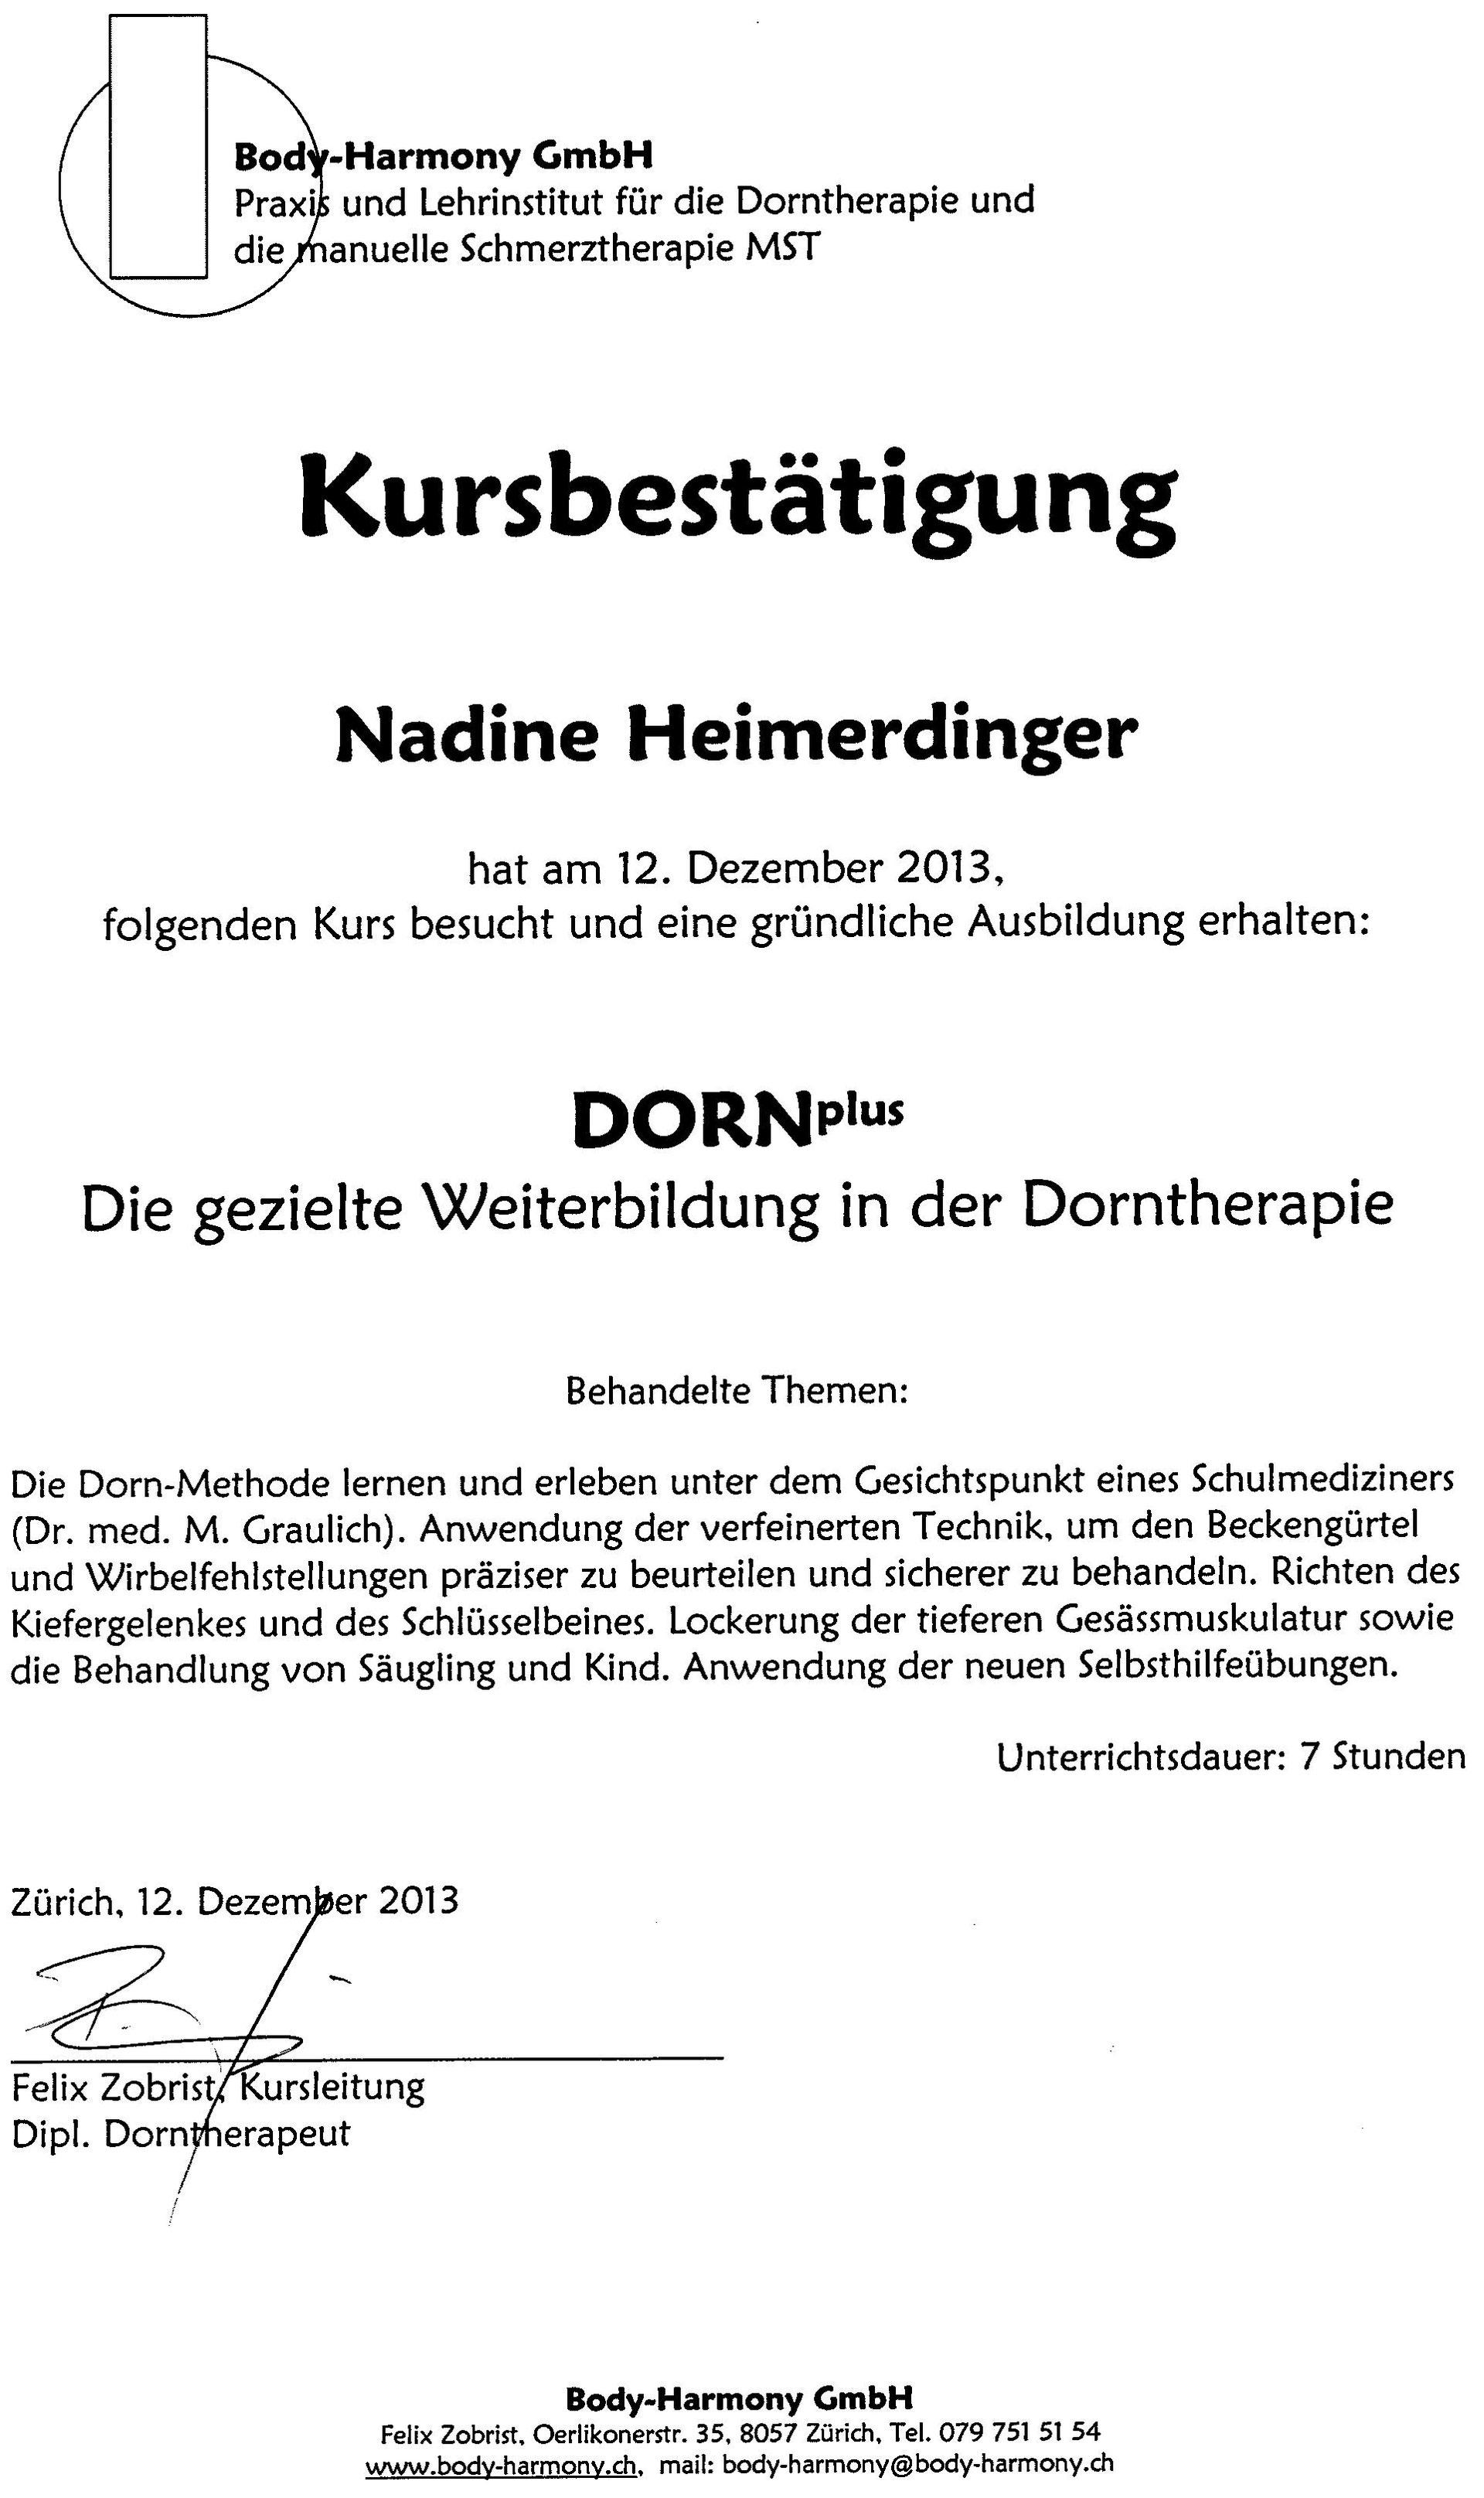 Beste Muskeln Des Beckengürtels Bilder - Anatomie Ideen - finotti.info